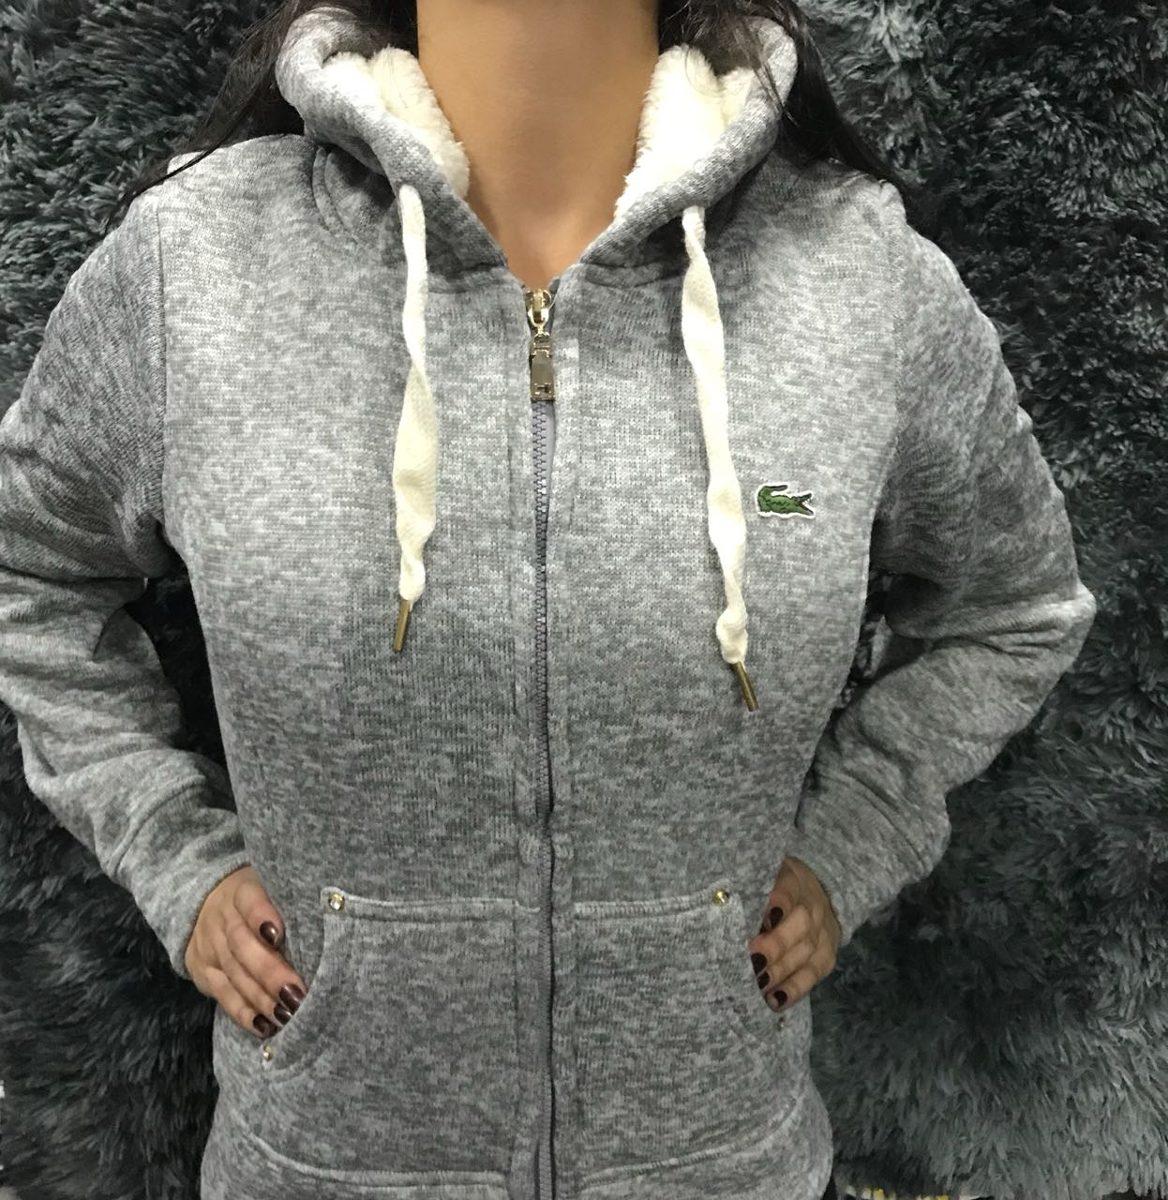 e3d9863913d33 casaco blusa feminina lacoste para frio intenso frete gratis. Carregando  zoom.